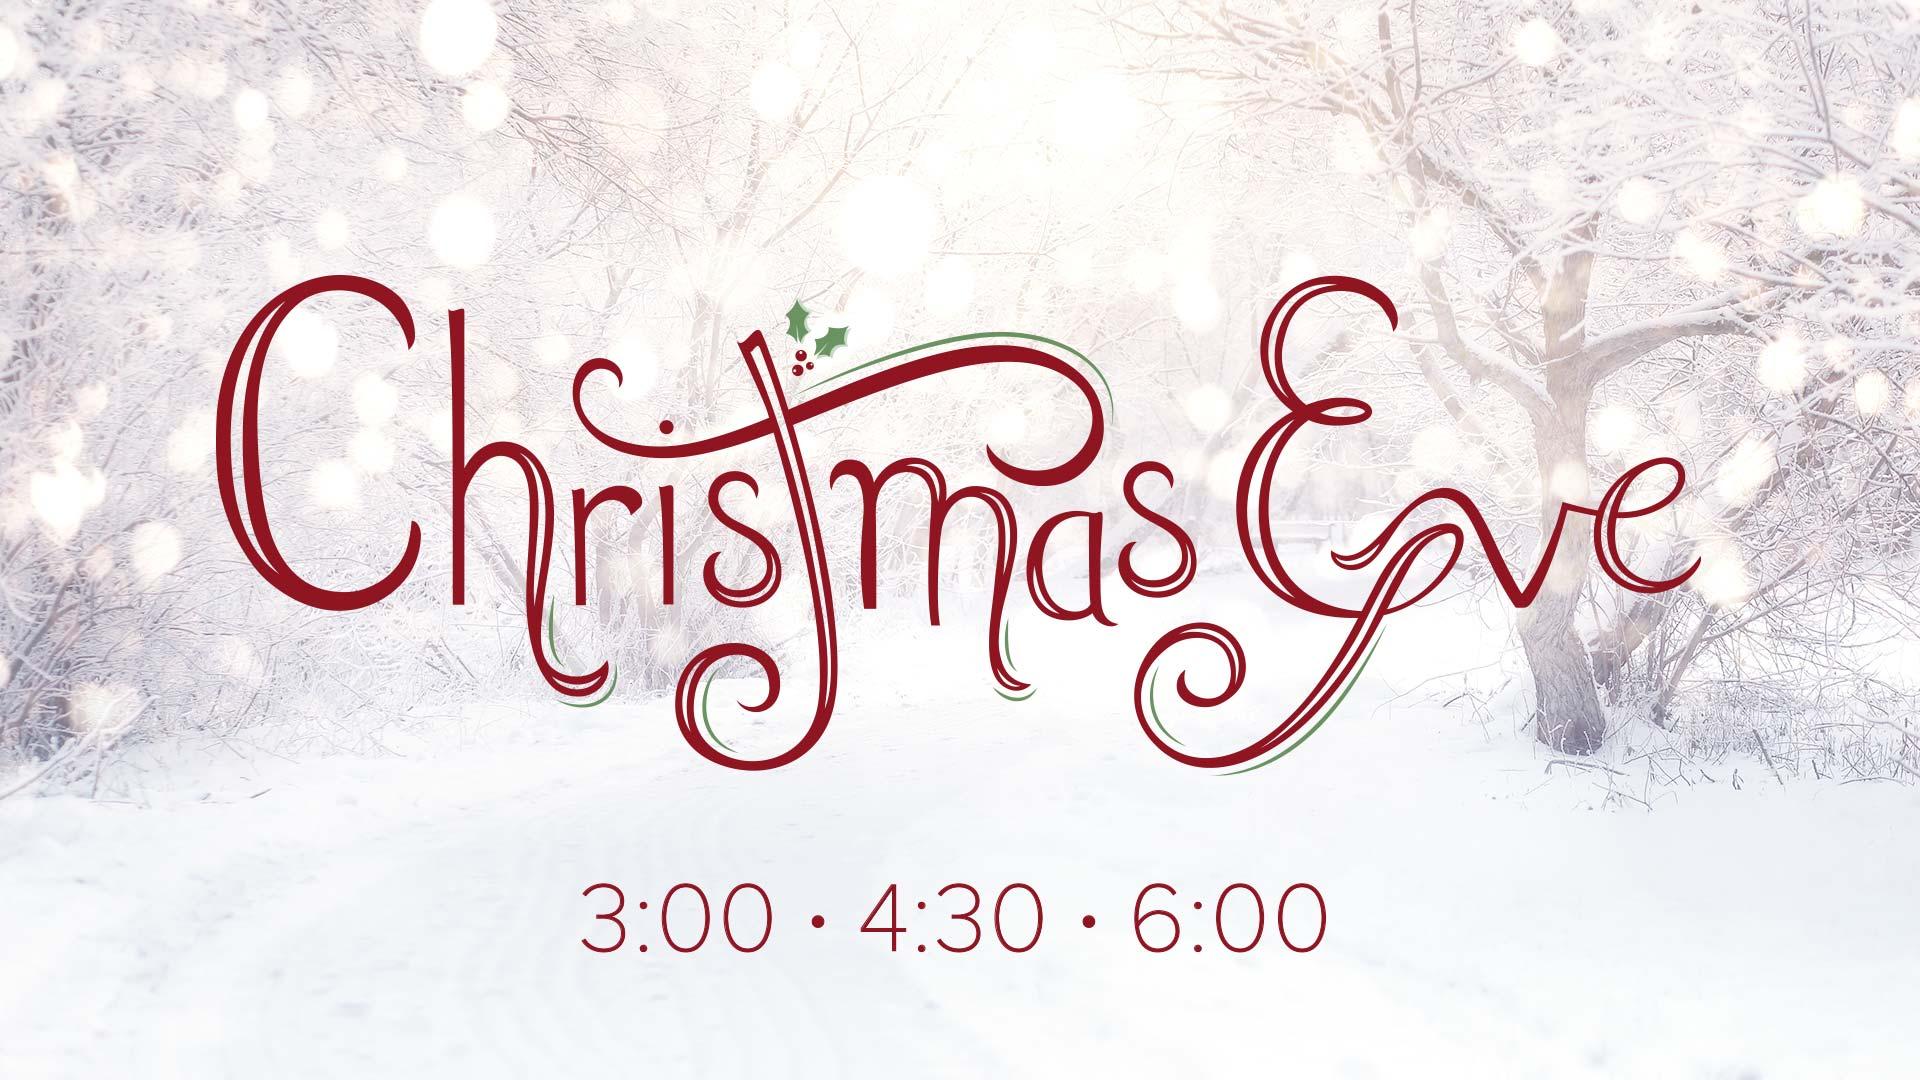 Christmas Eve 18 Primary-Image image